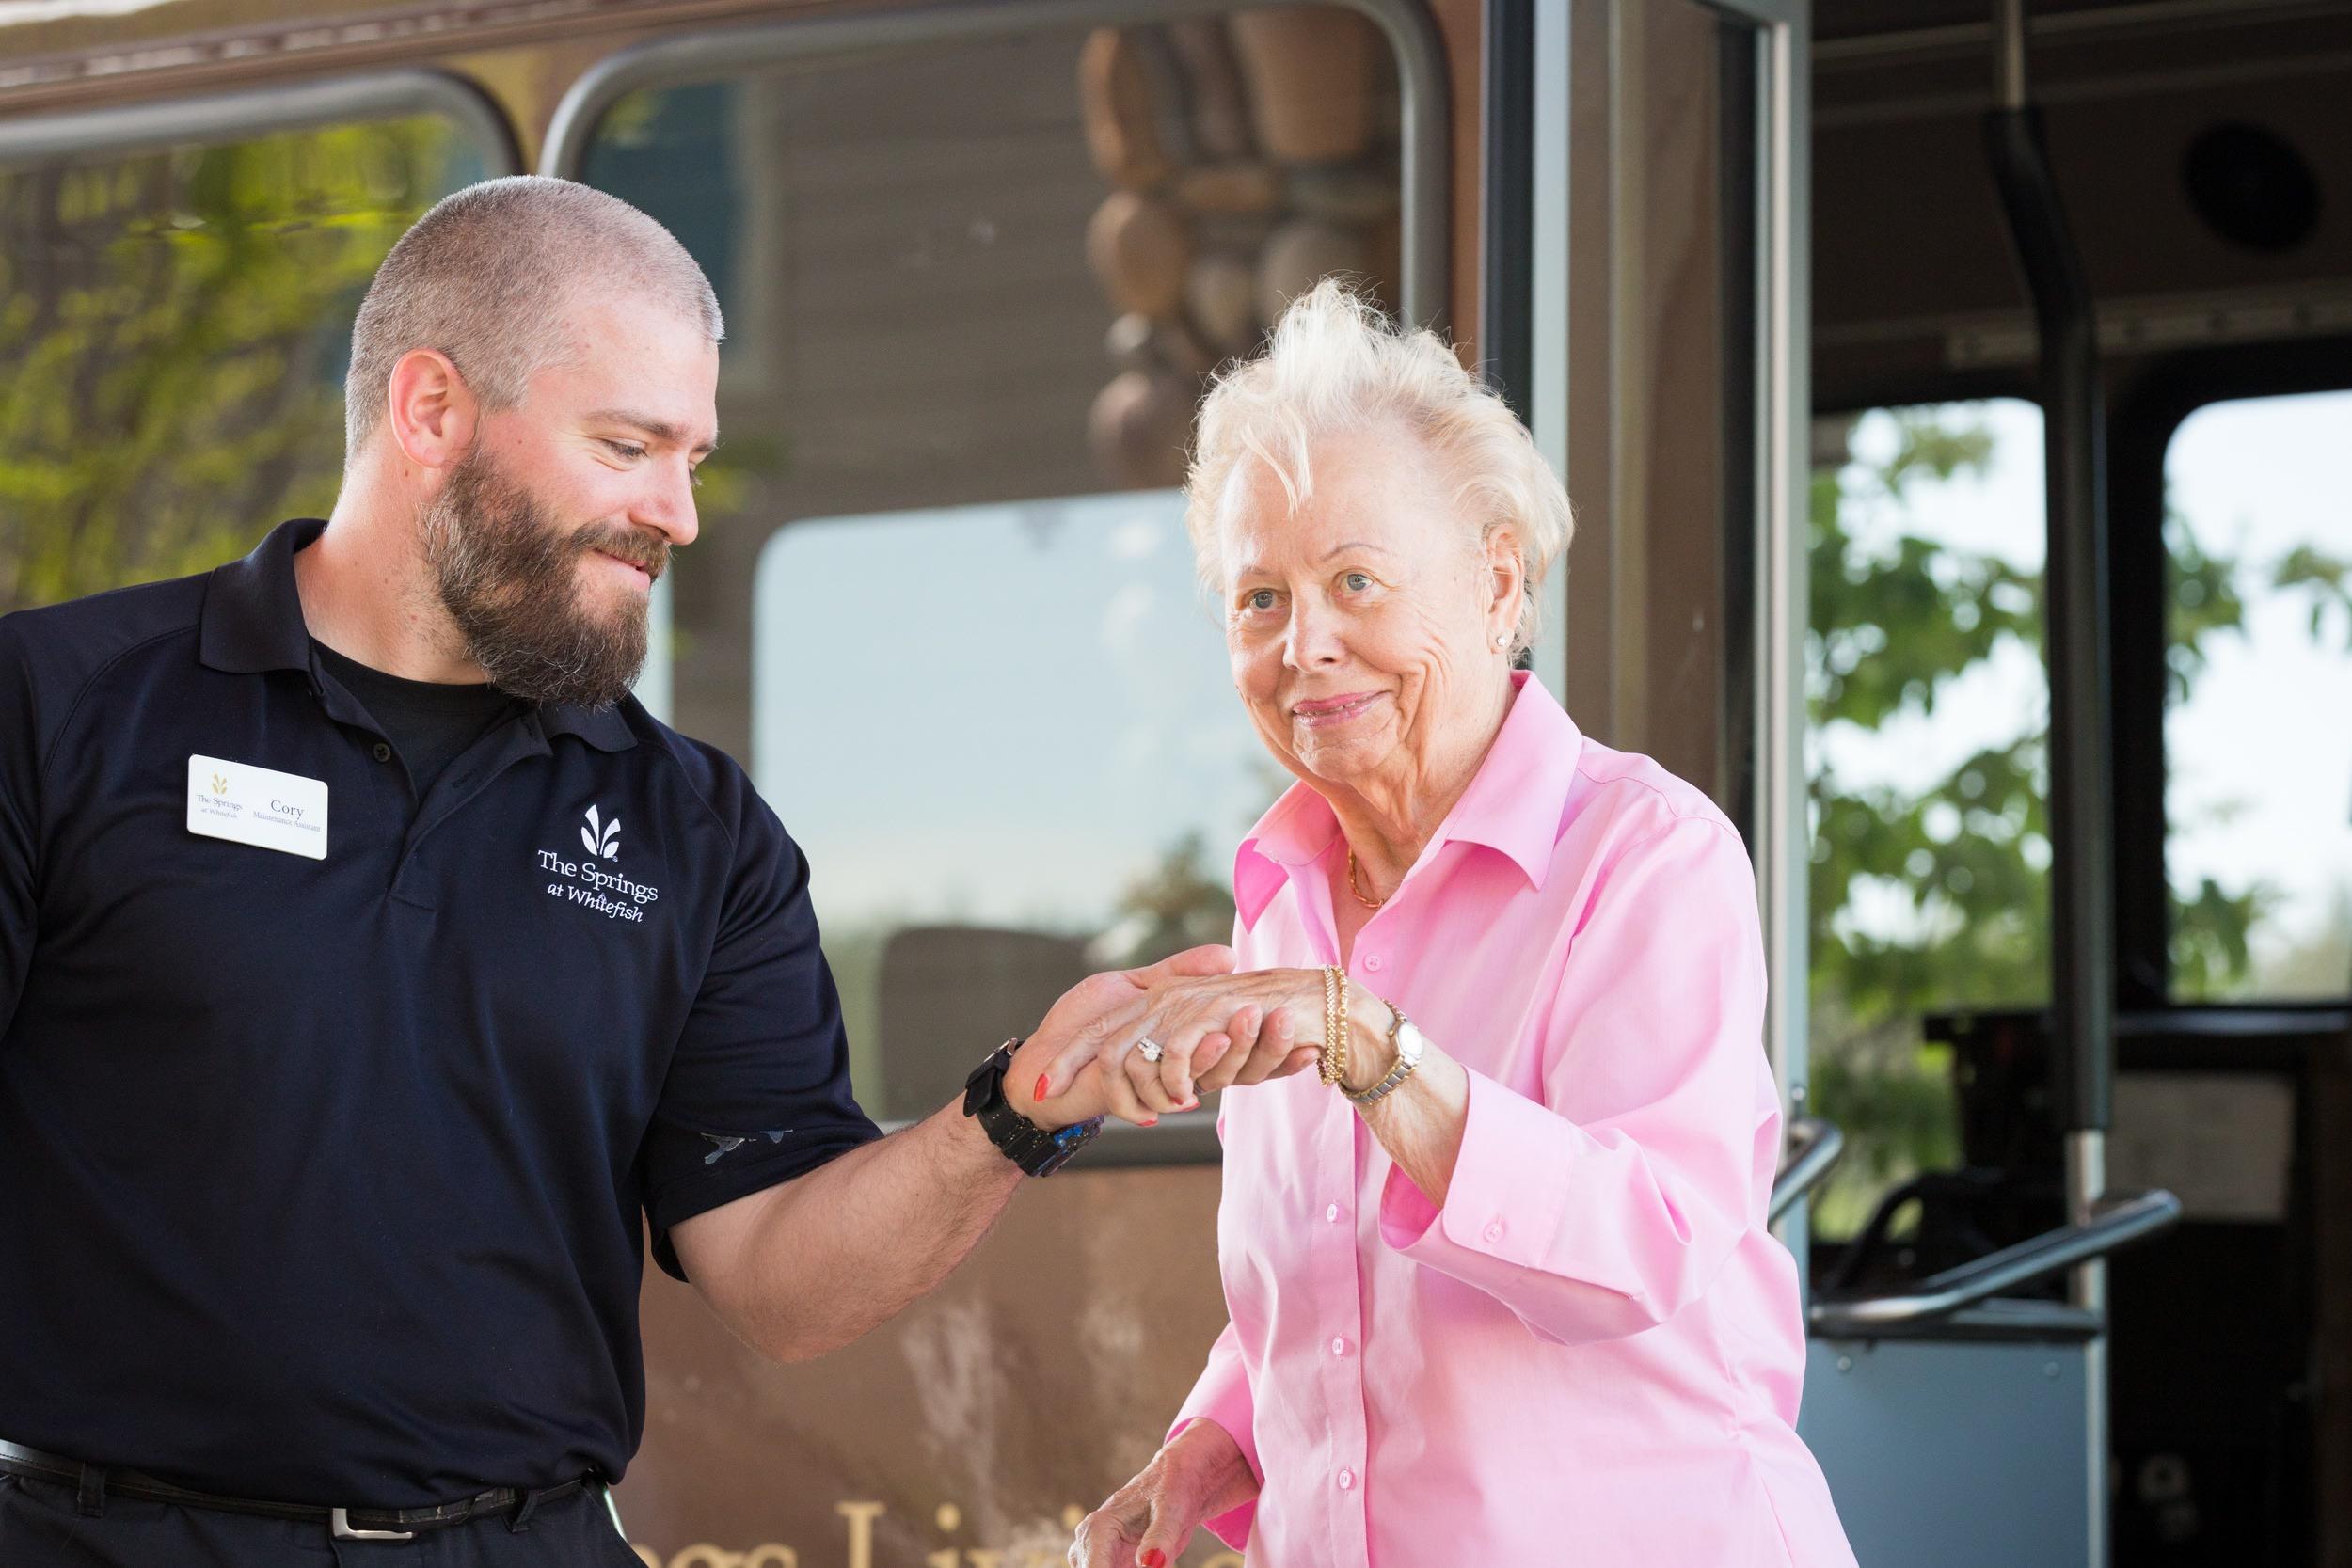 A resident enjoys our transportation services at Whitefish, MT senior living